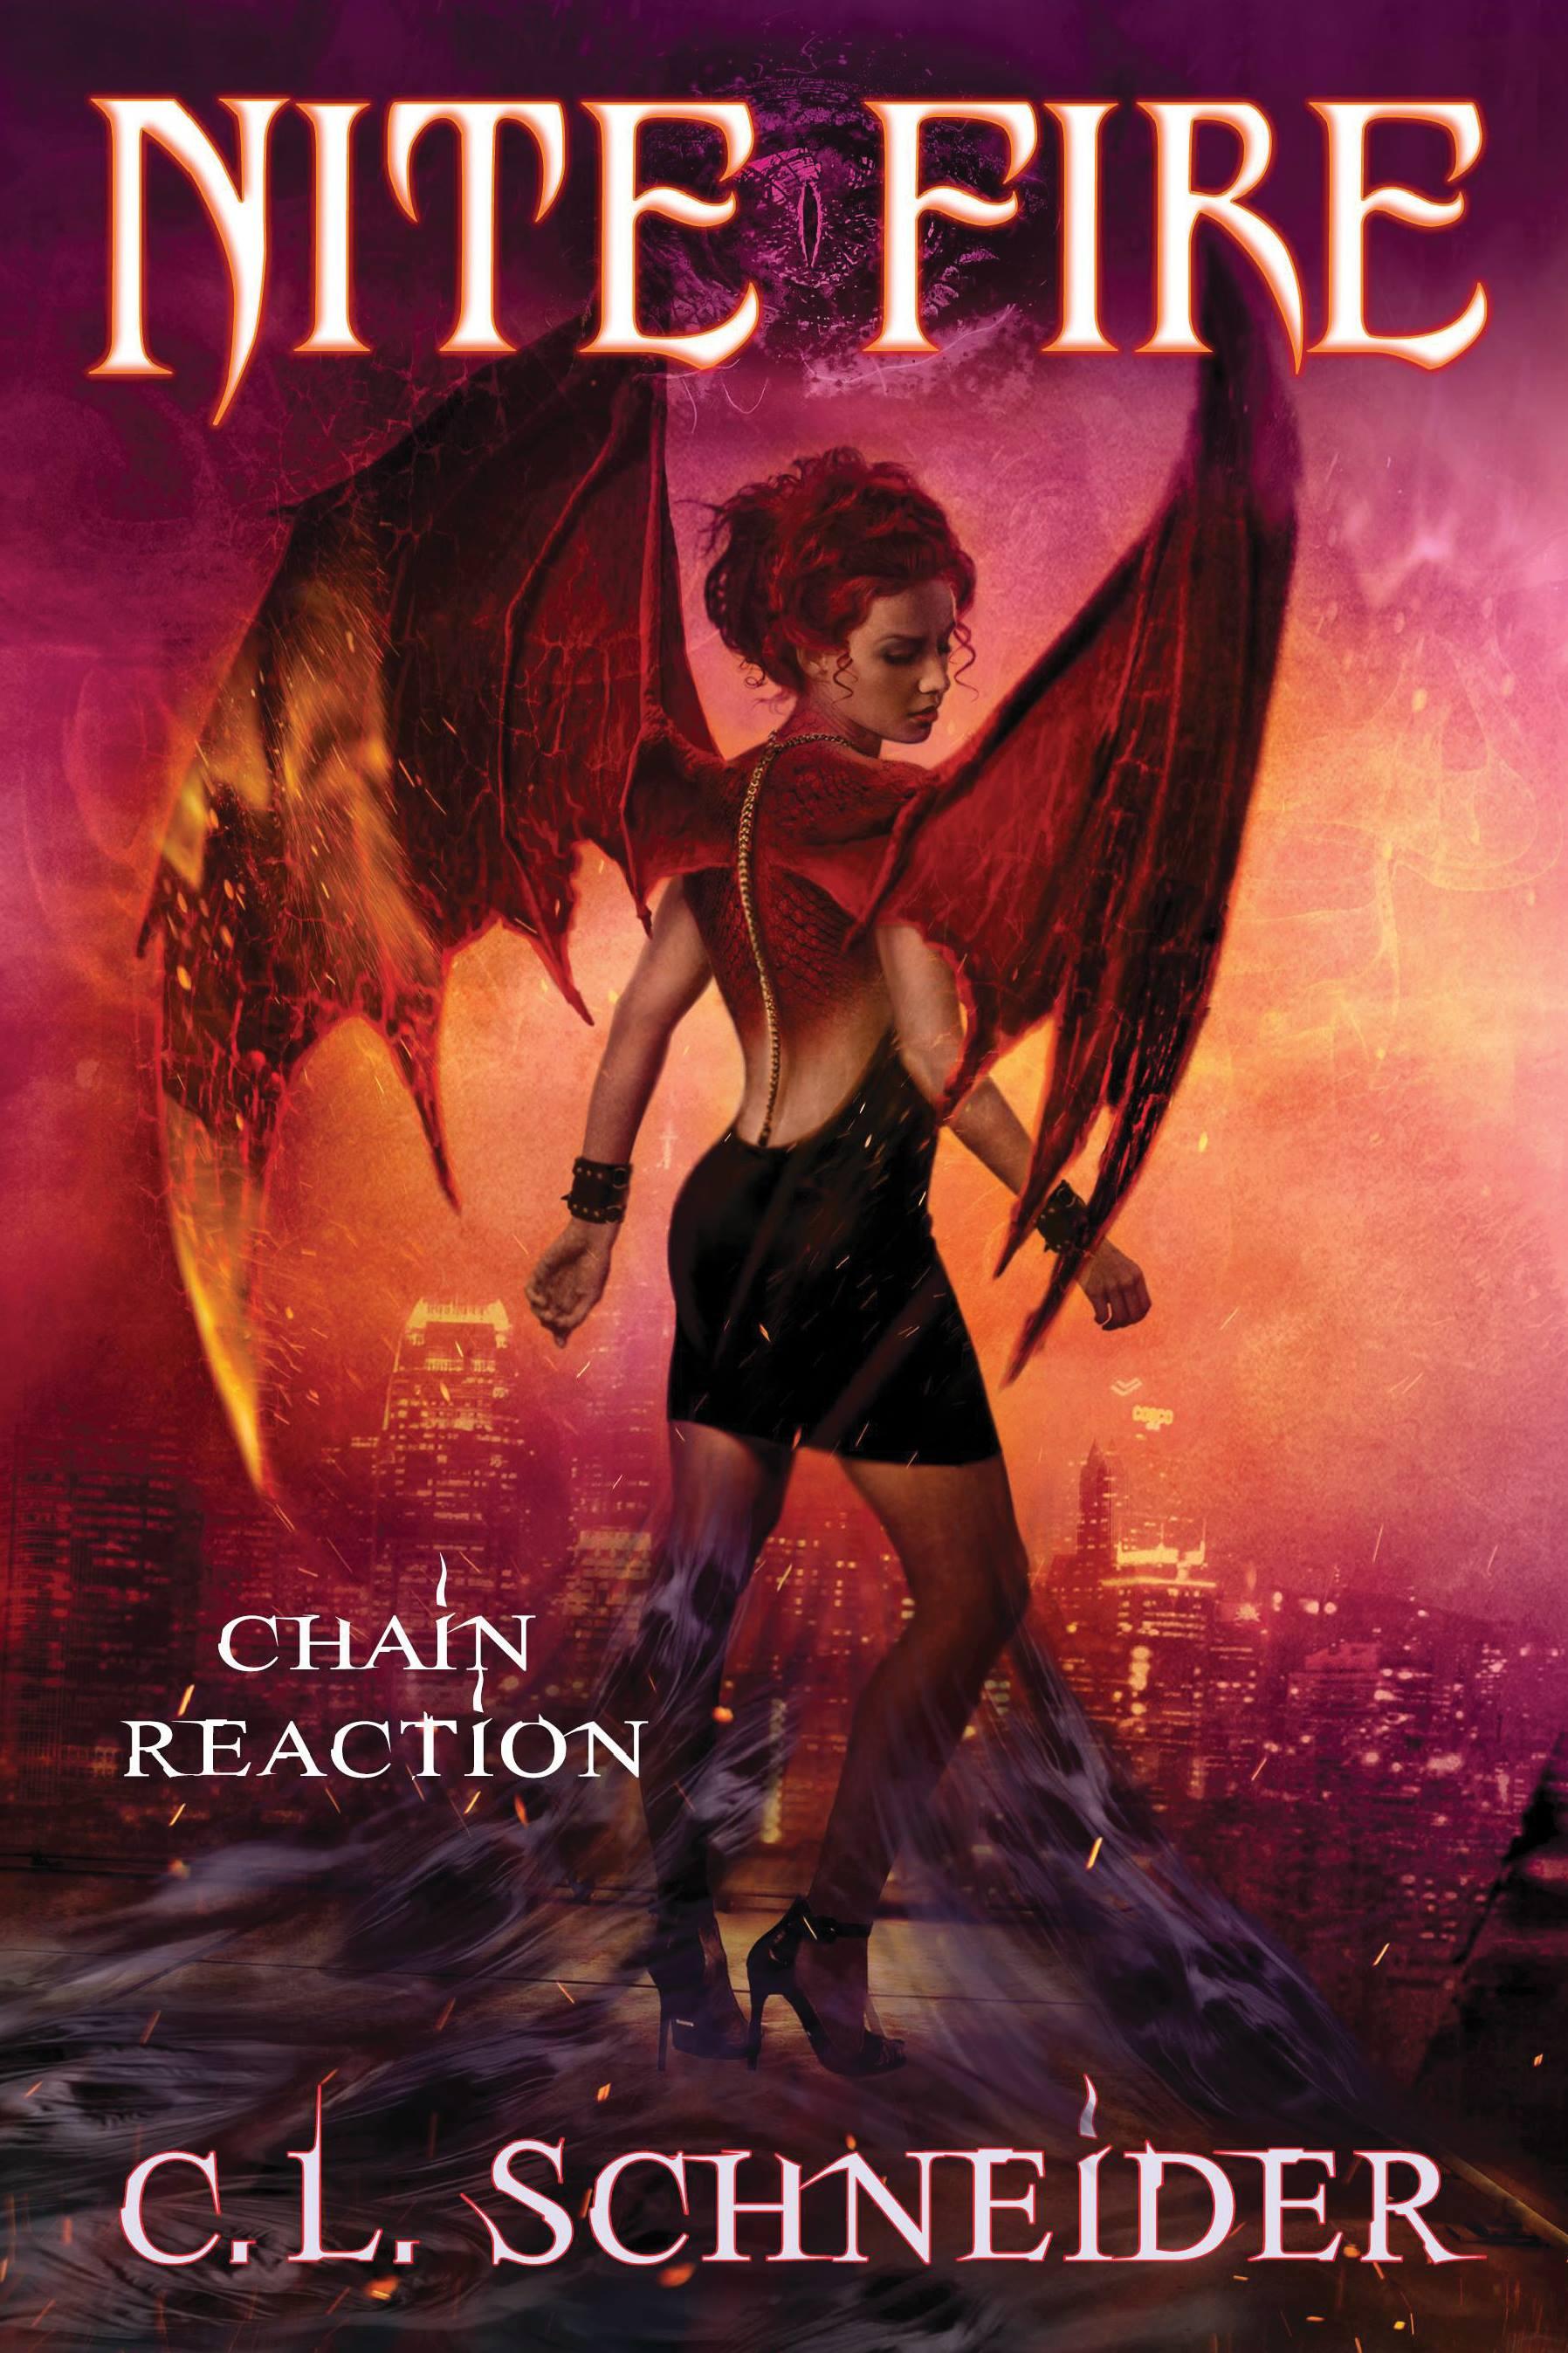 C.L.Schneider Nite Fie: Chain Reaction cover reveal urban fantasy